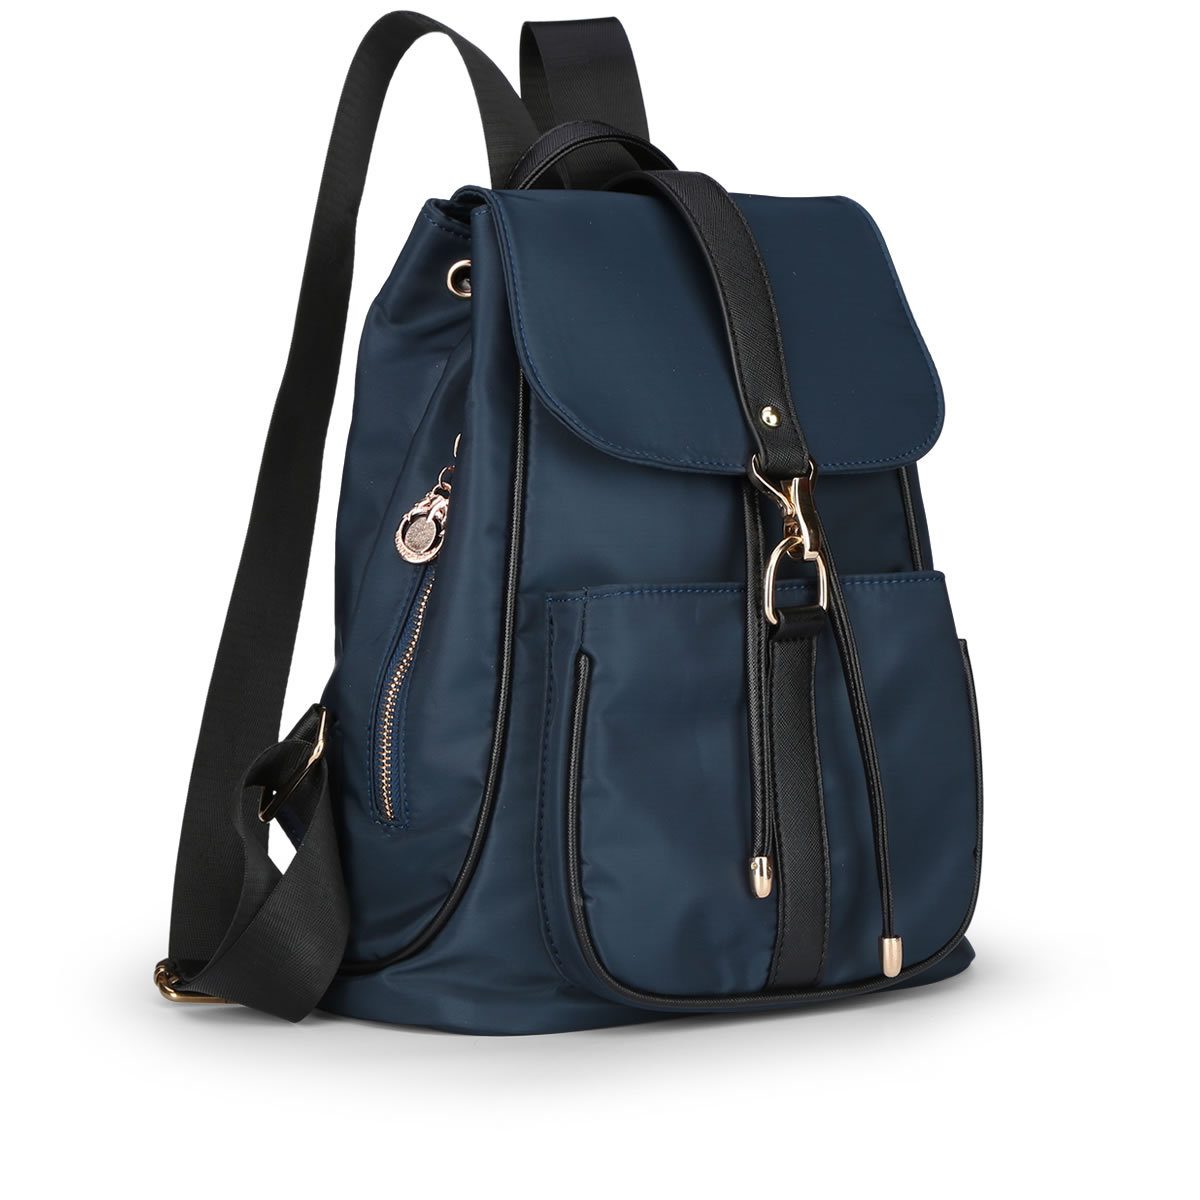 Popular Stylish Backpacks for Women-Buy Cheap Stylish Backpacks ...